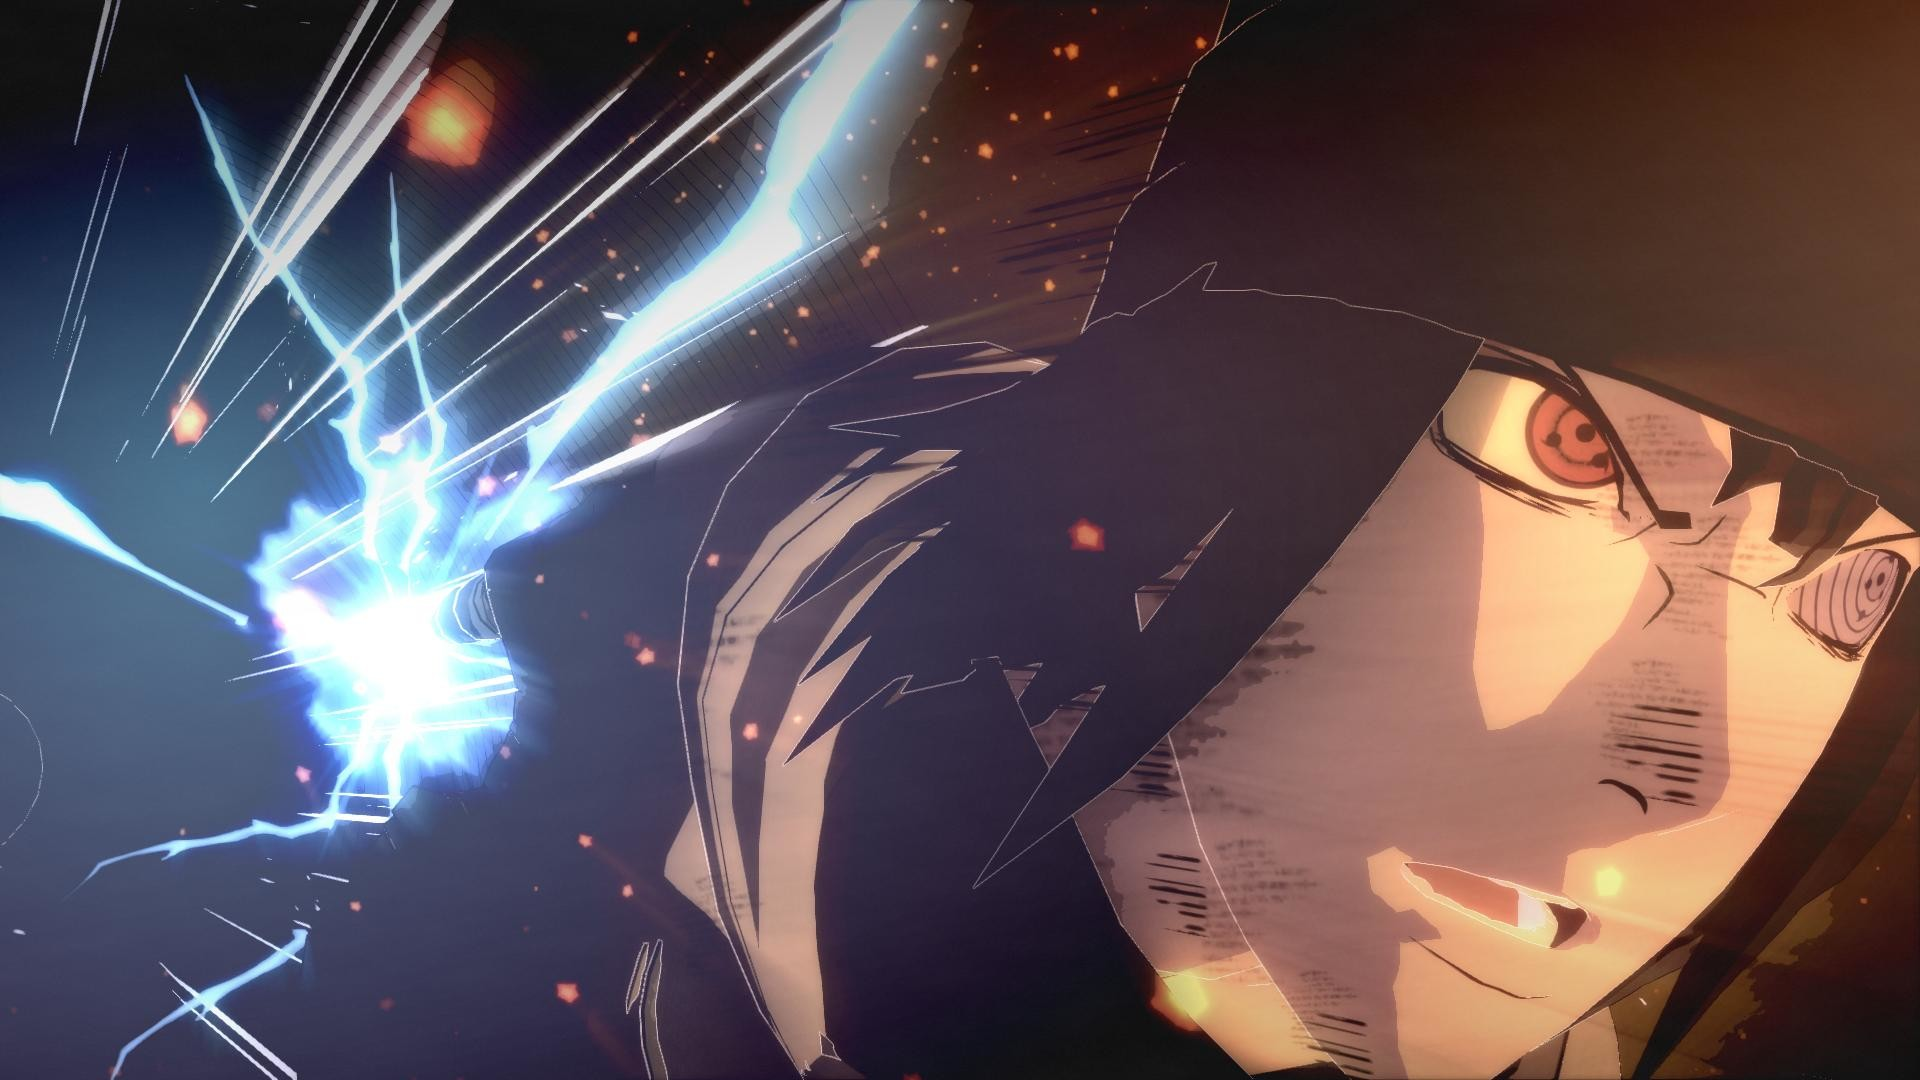 Video Game – Naruto Shippuden: Ultimate Ninja Storm 4 Sasuke Uchiha  Wallpaper